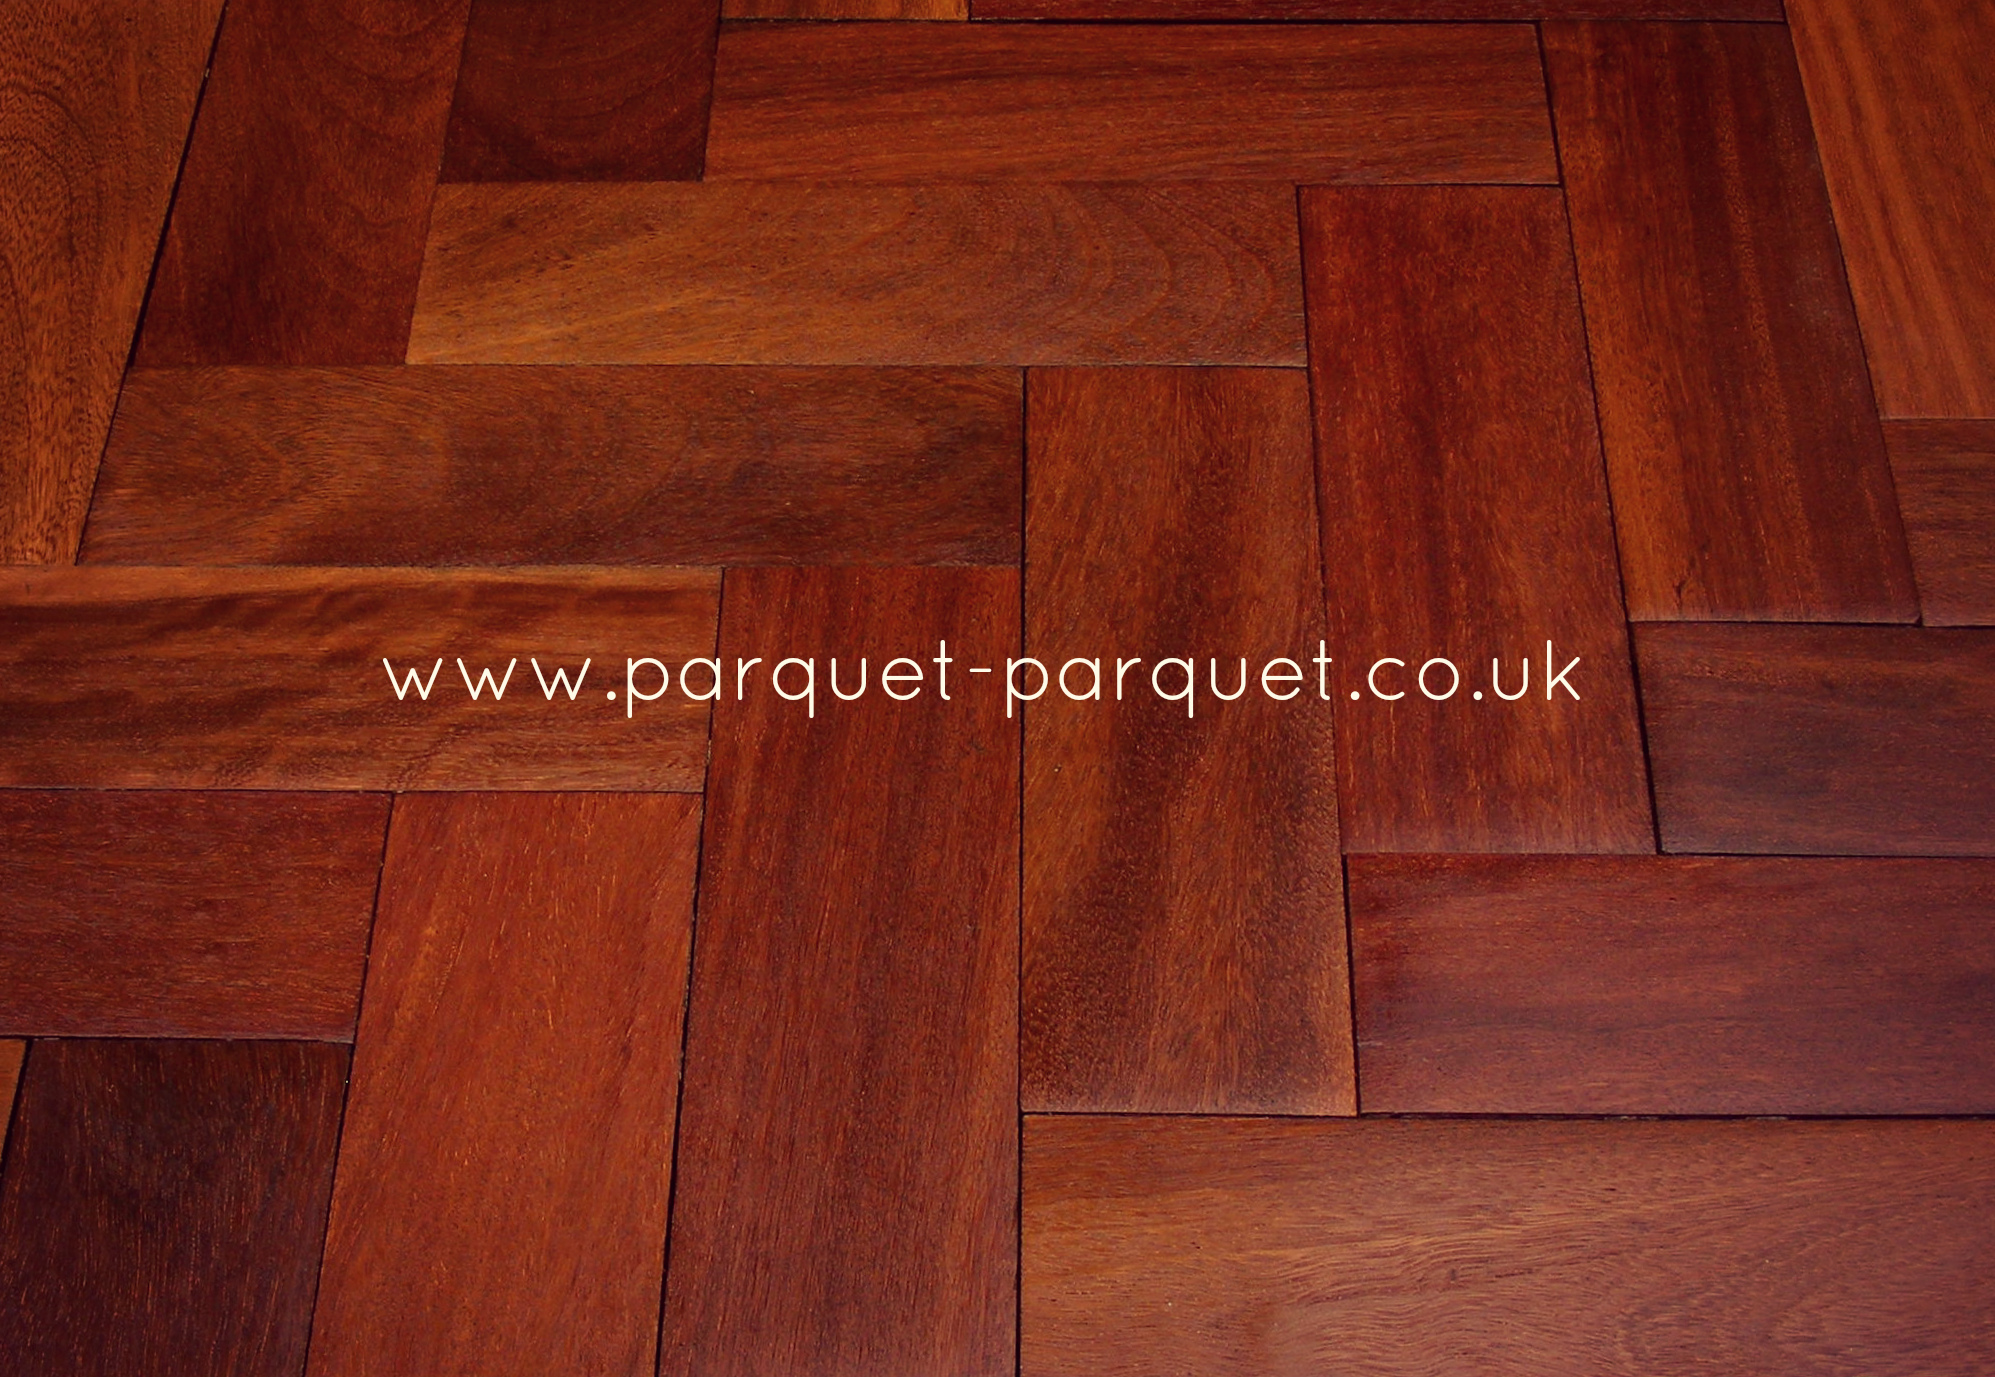 Rhodesian mahogany reclaimed parquet parquet parquet for Mahogany flooring